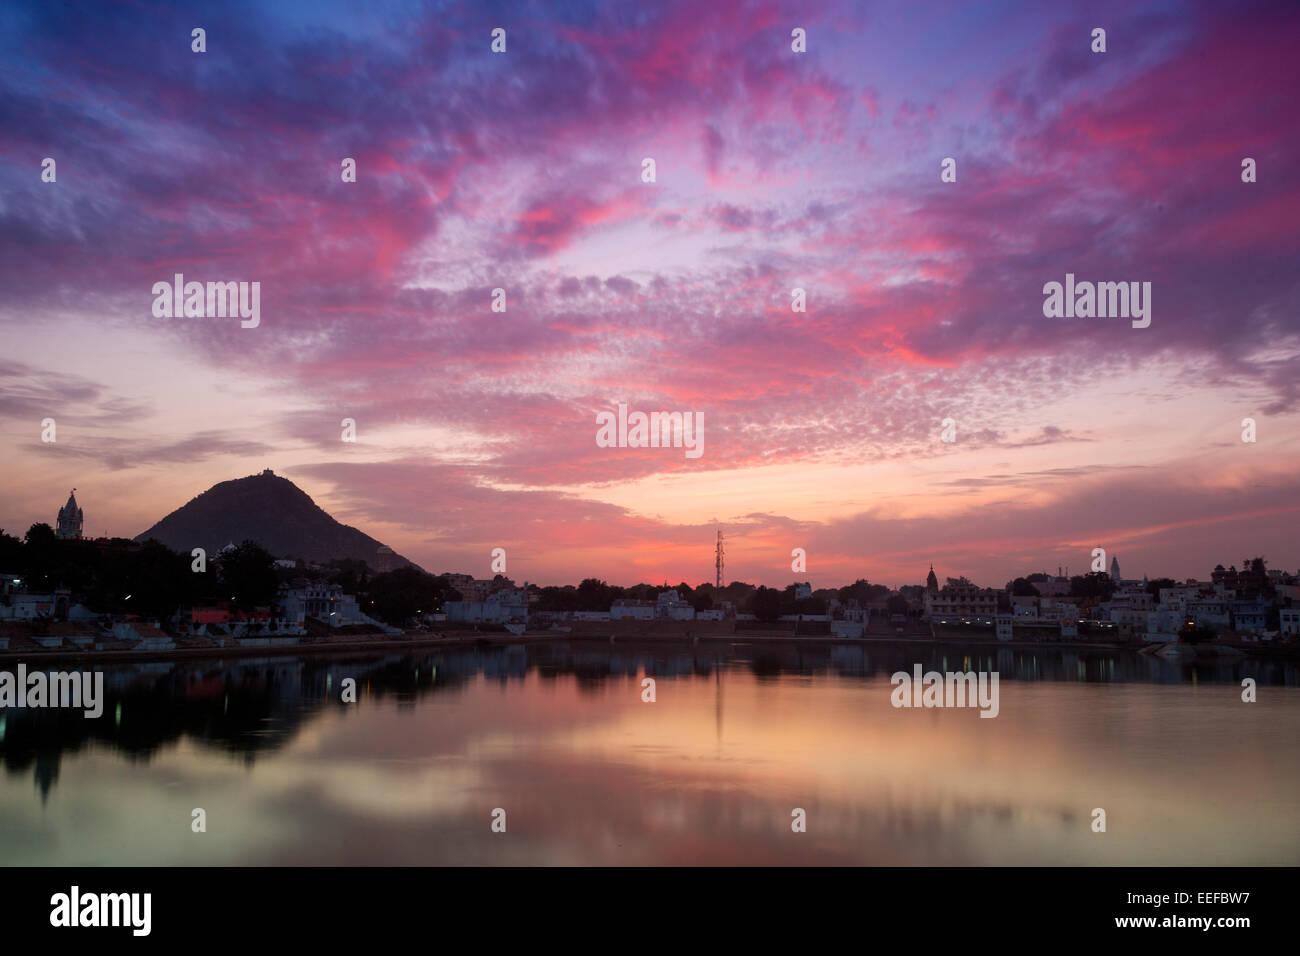 India, Rajasthan, Pushkar at twilight - Stock Image